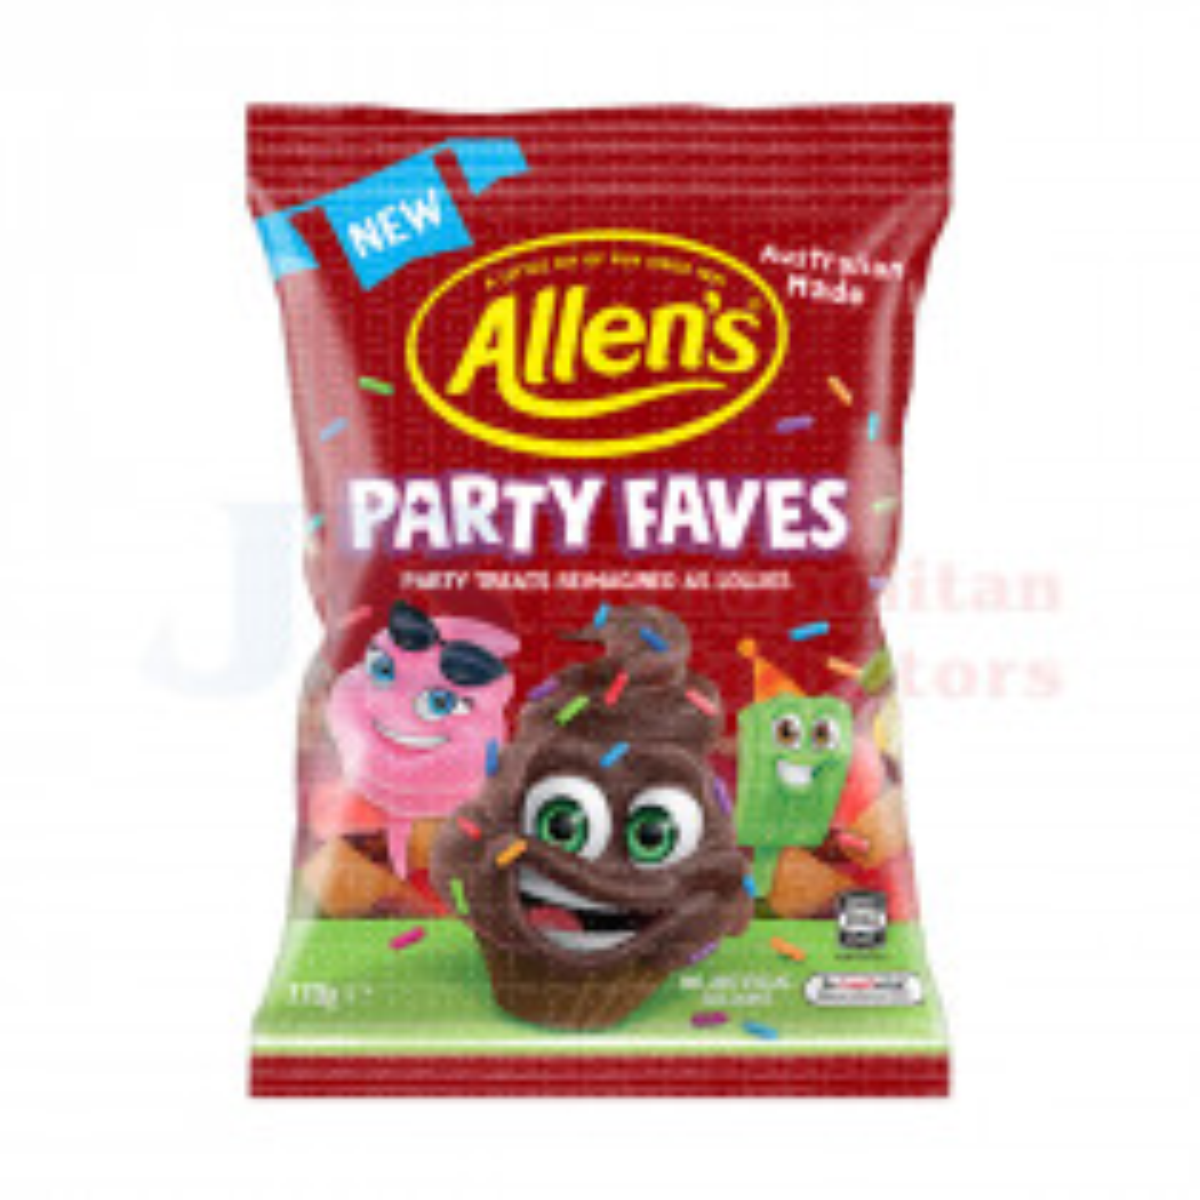 170G ALLEN'S PARTY FAVES